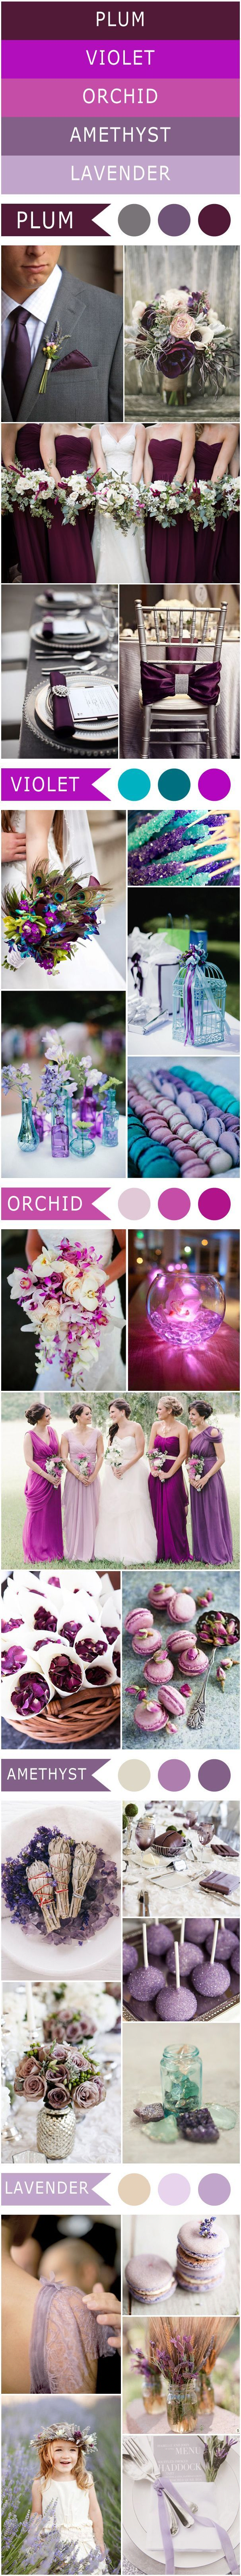 best wedding images on Pinterest Weddings Flower arrangements